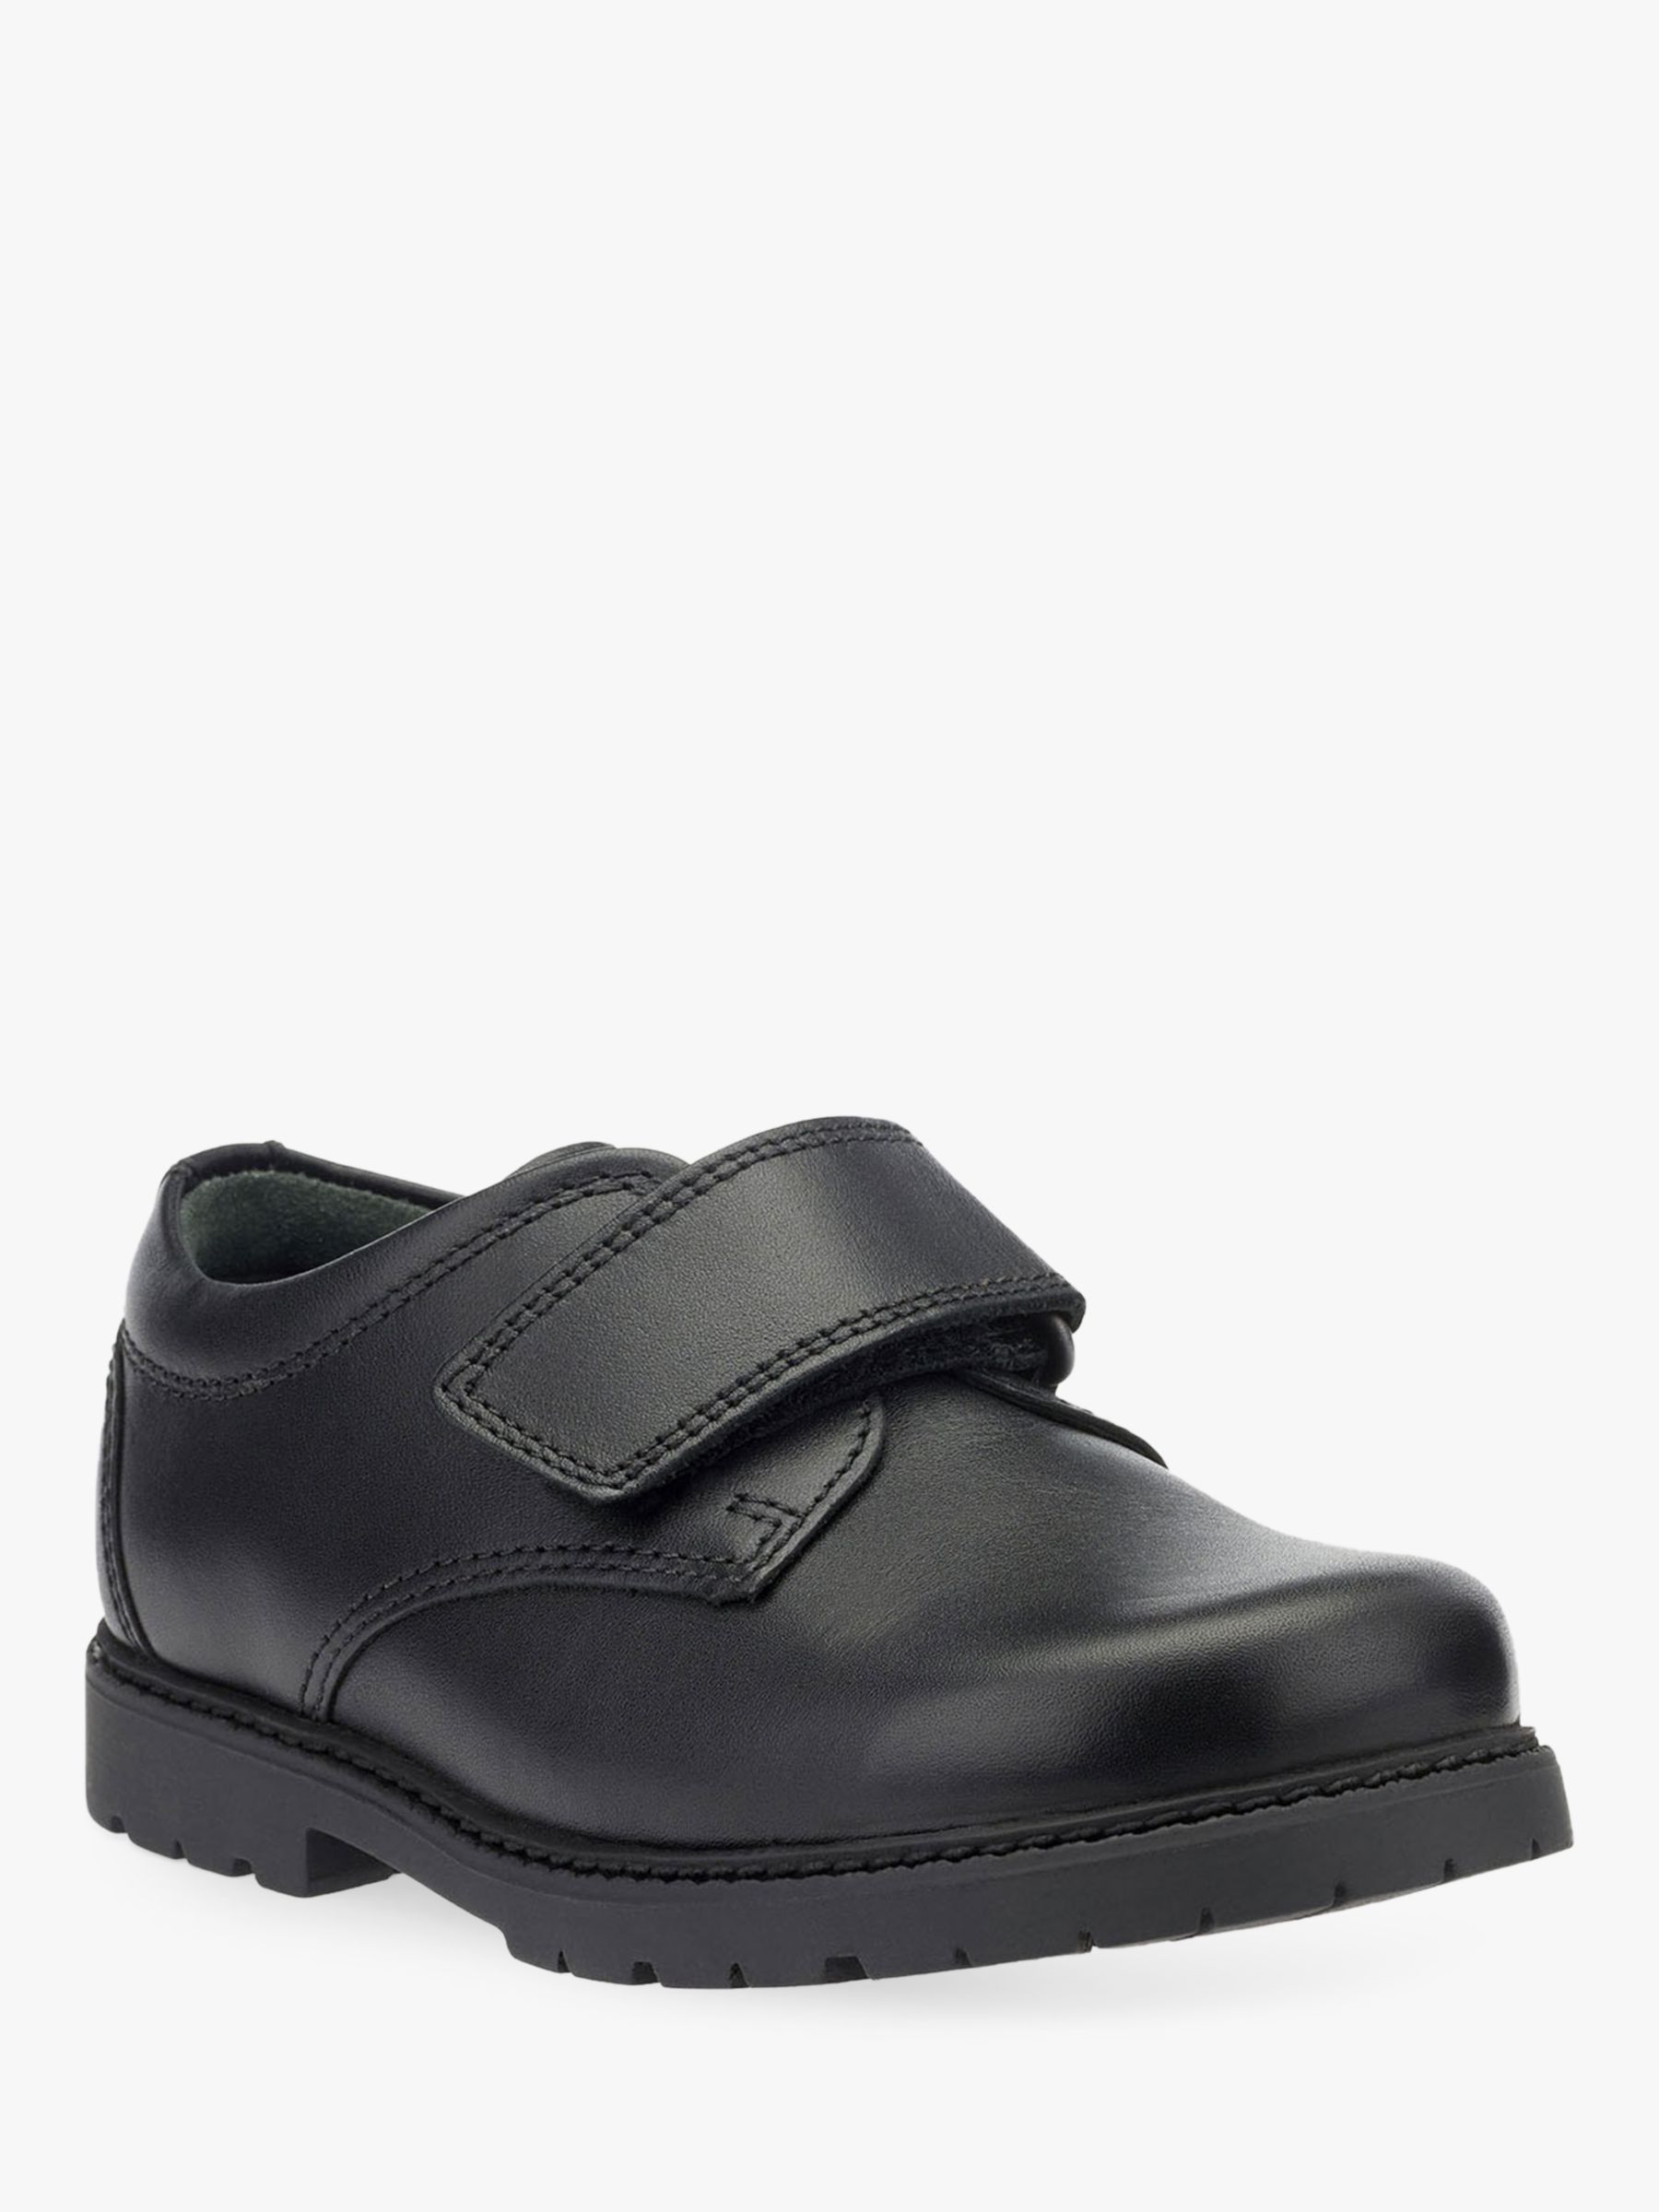 Start-Rite Start-rite Will Leather Riptape Shoes, Black